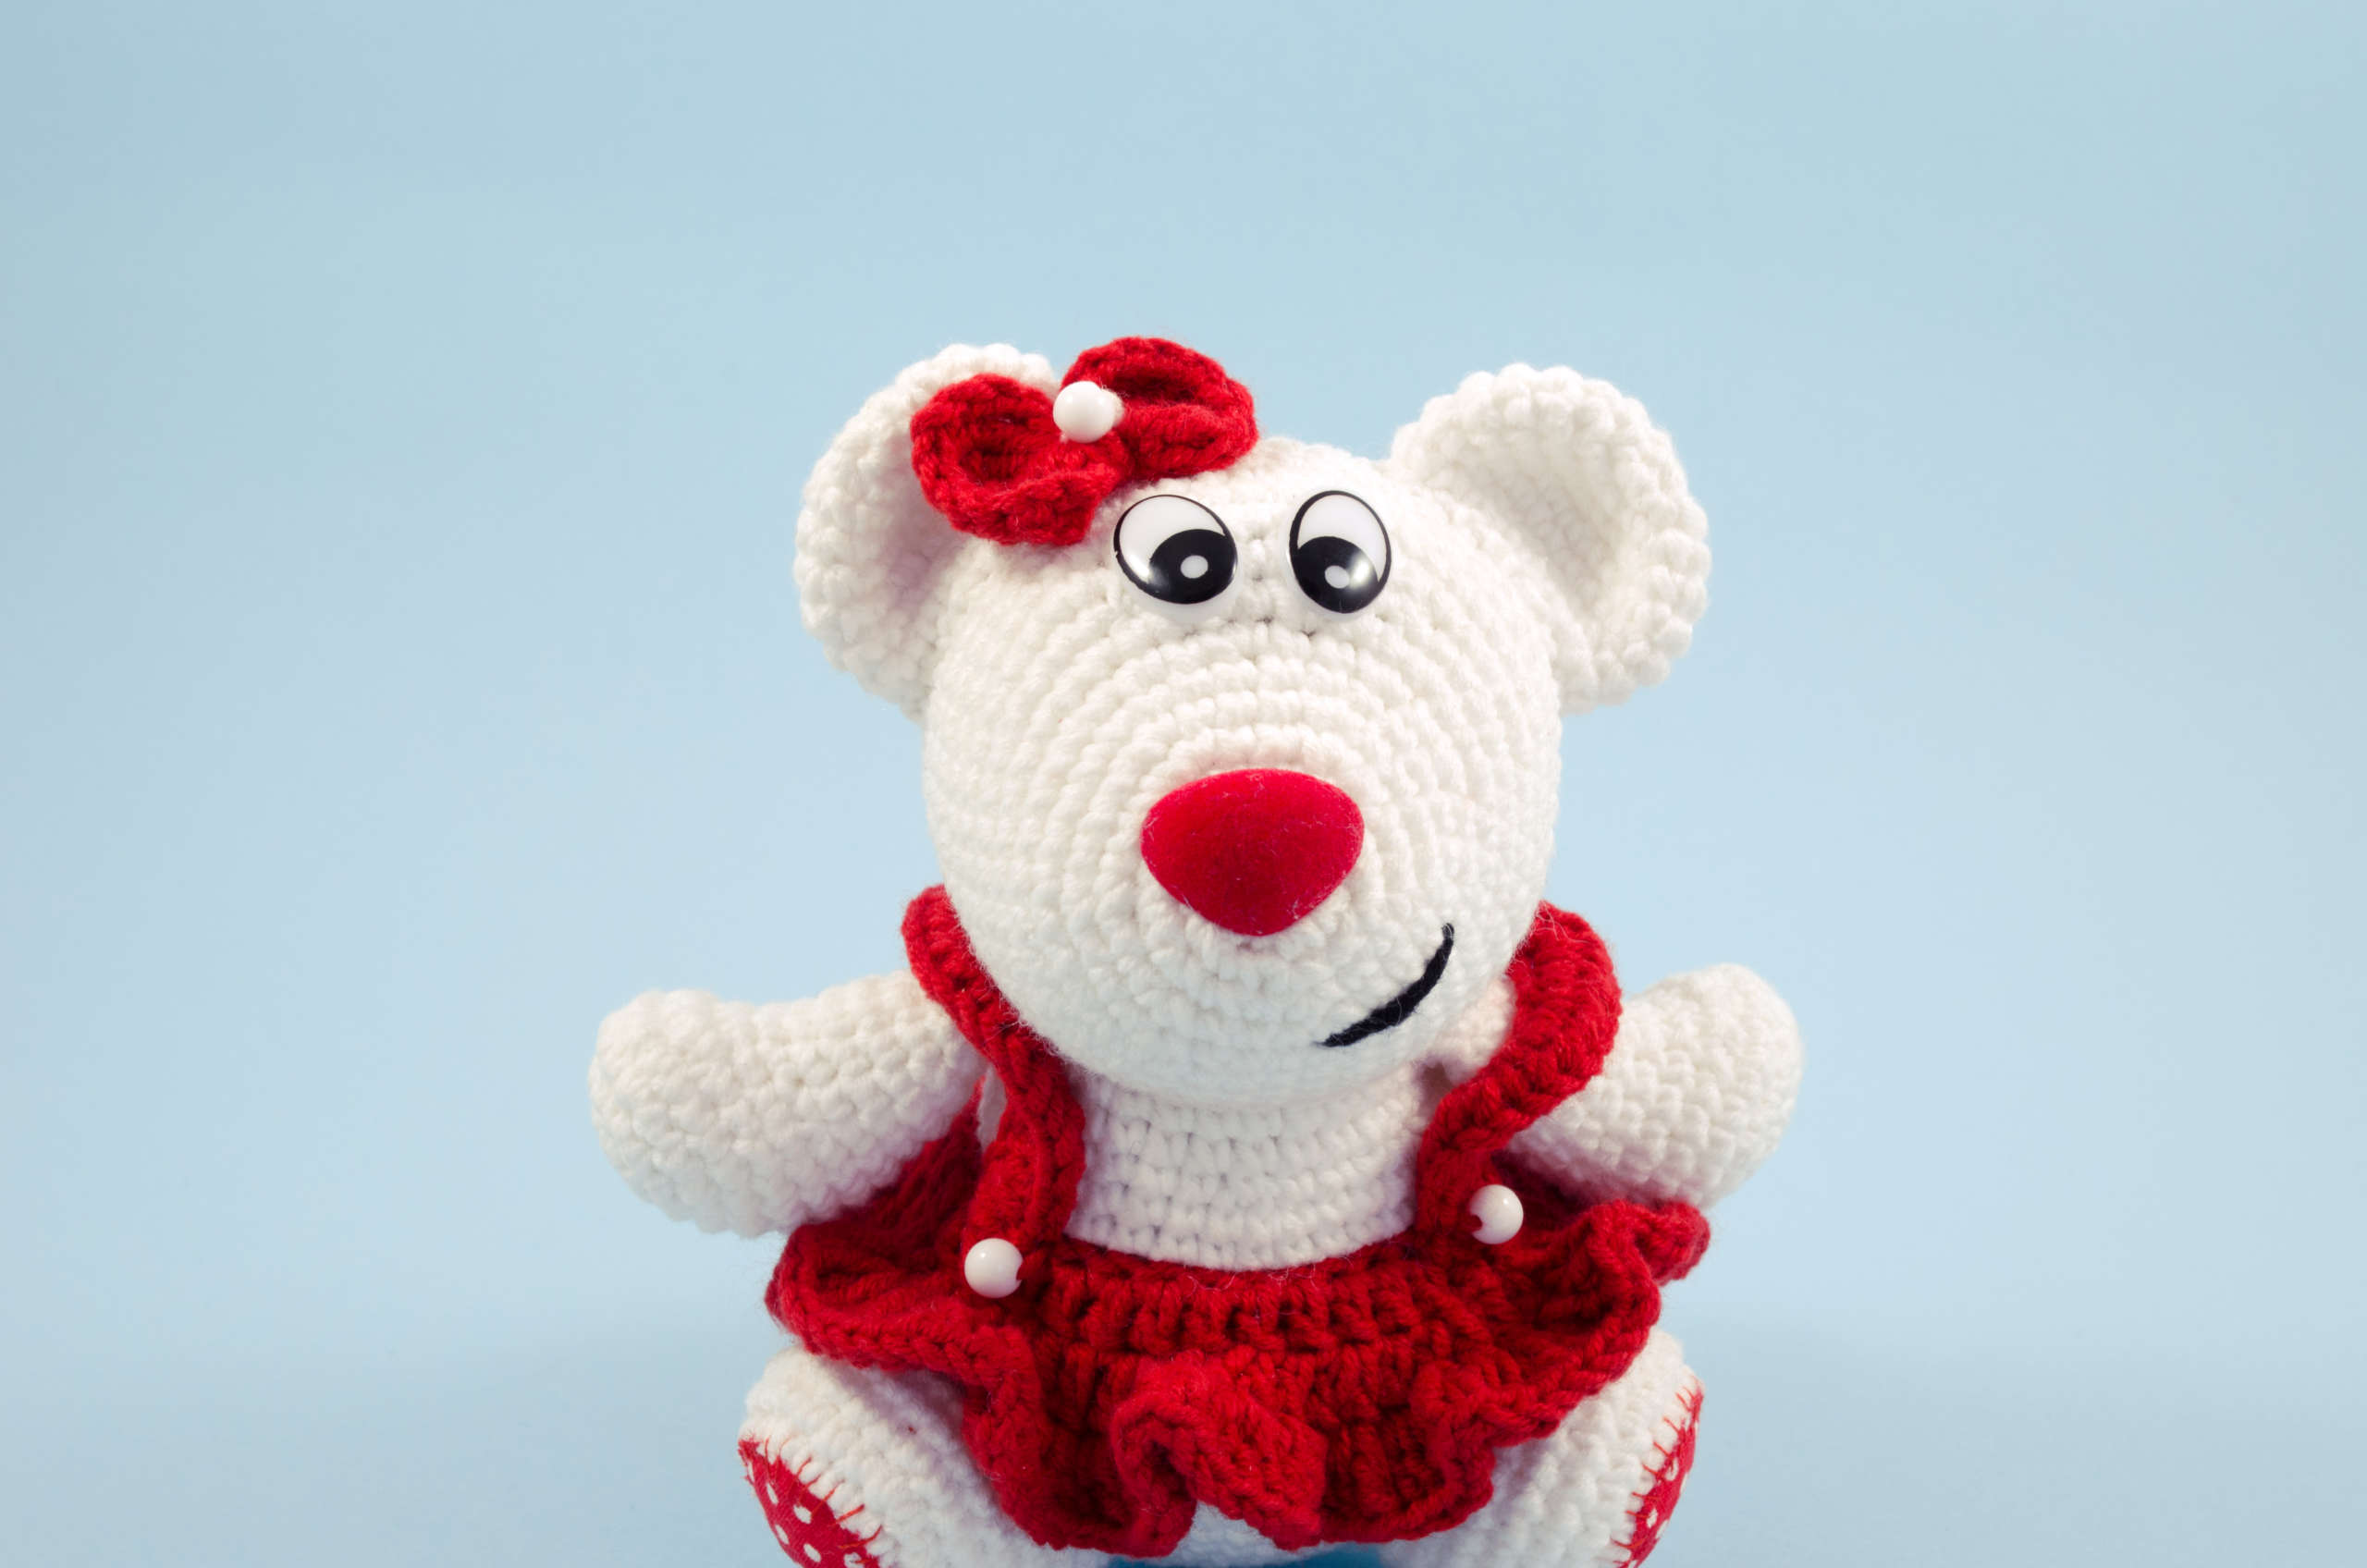 crochet snow white teddy bear close up view